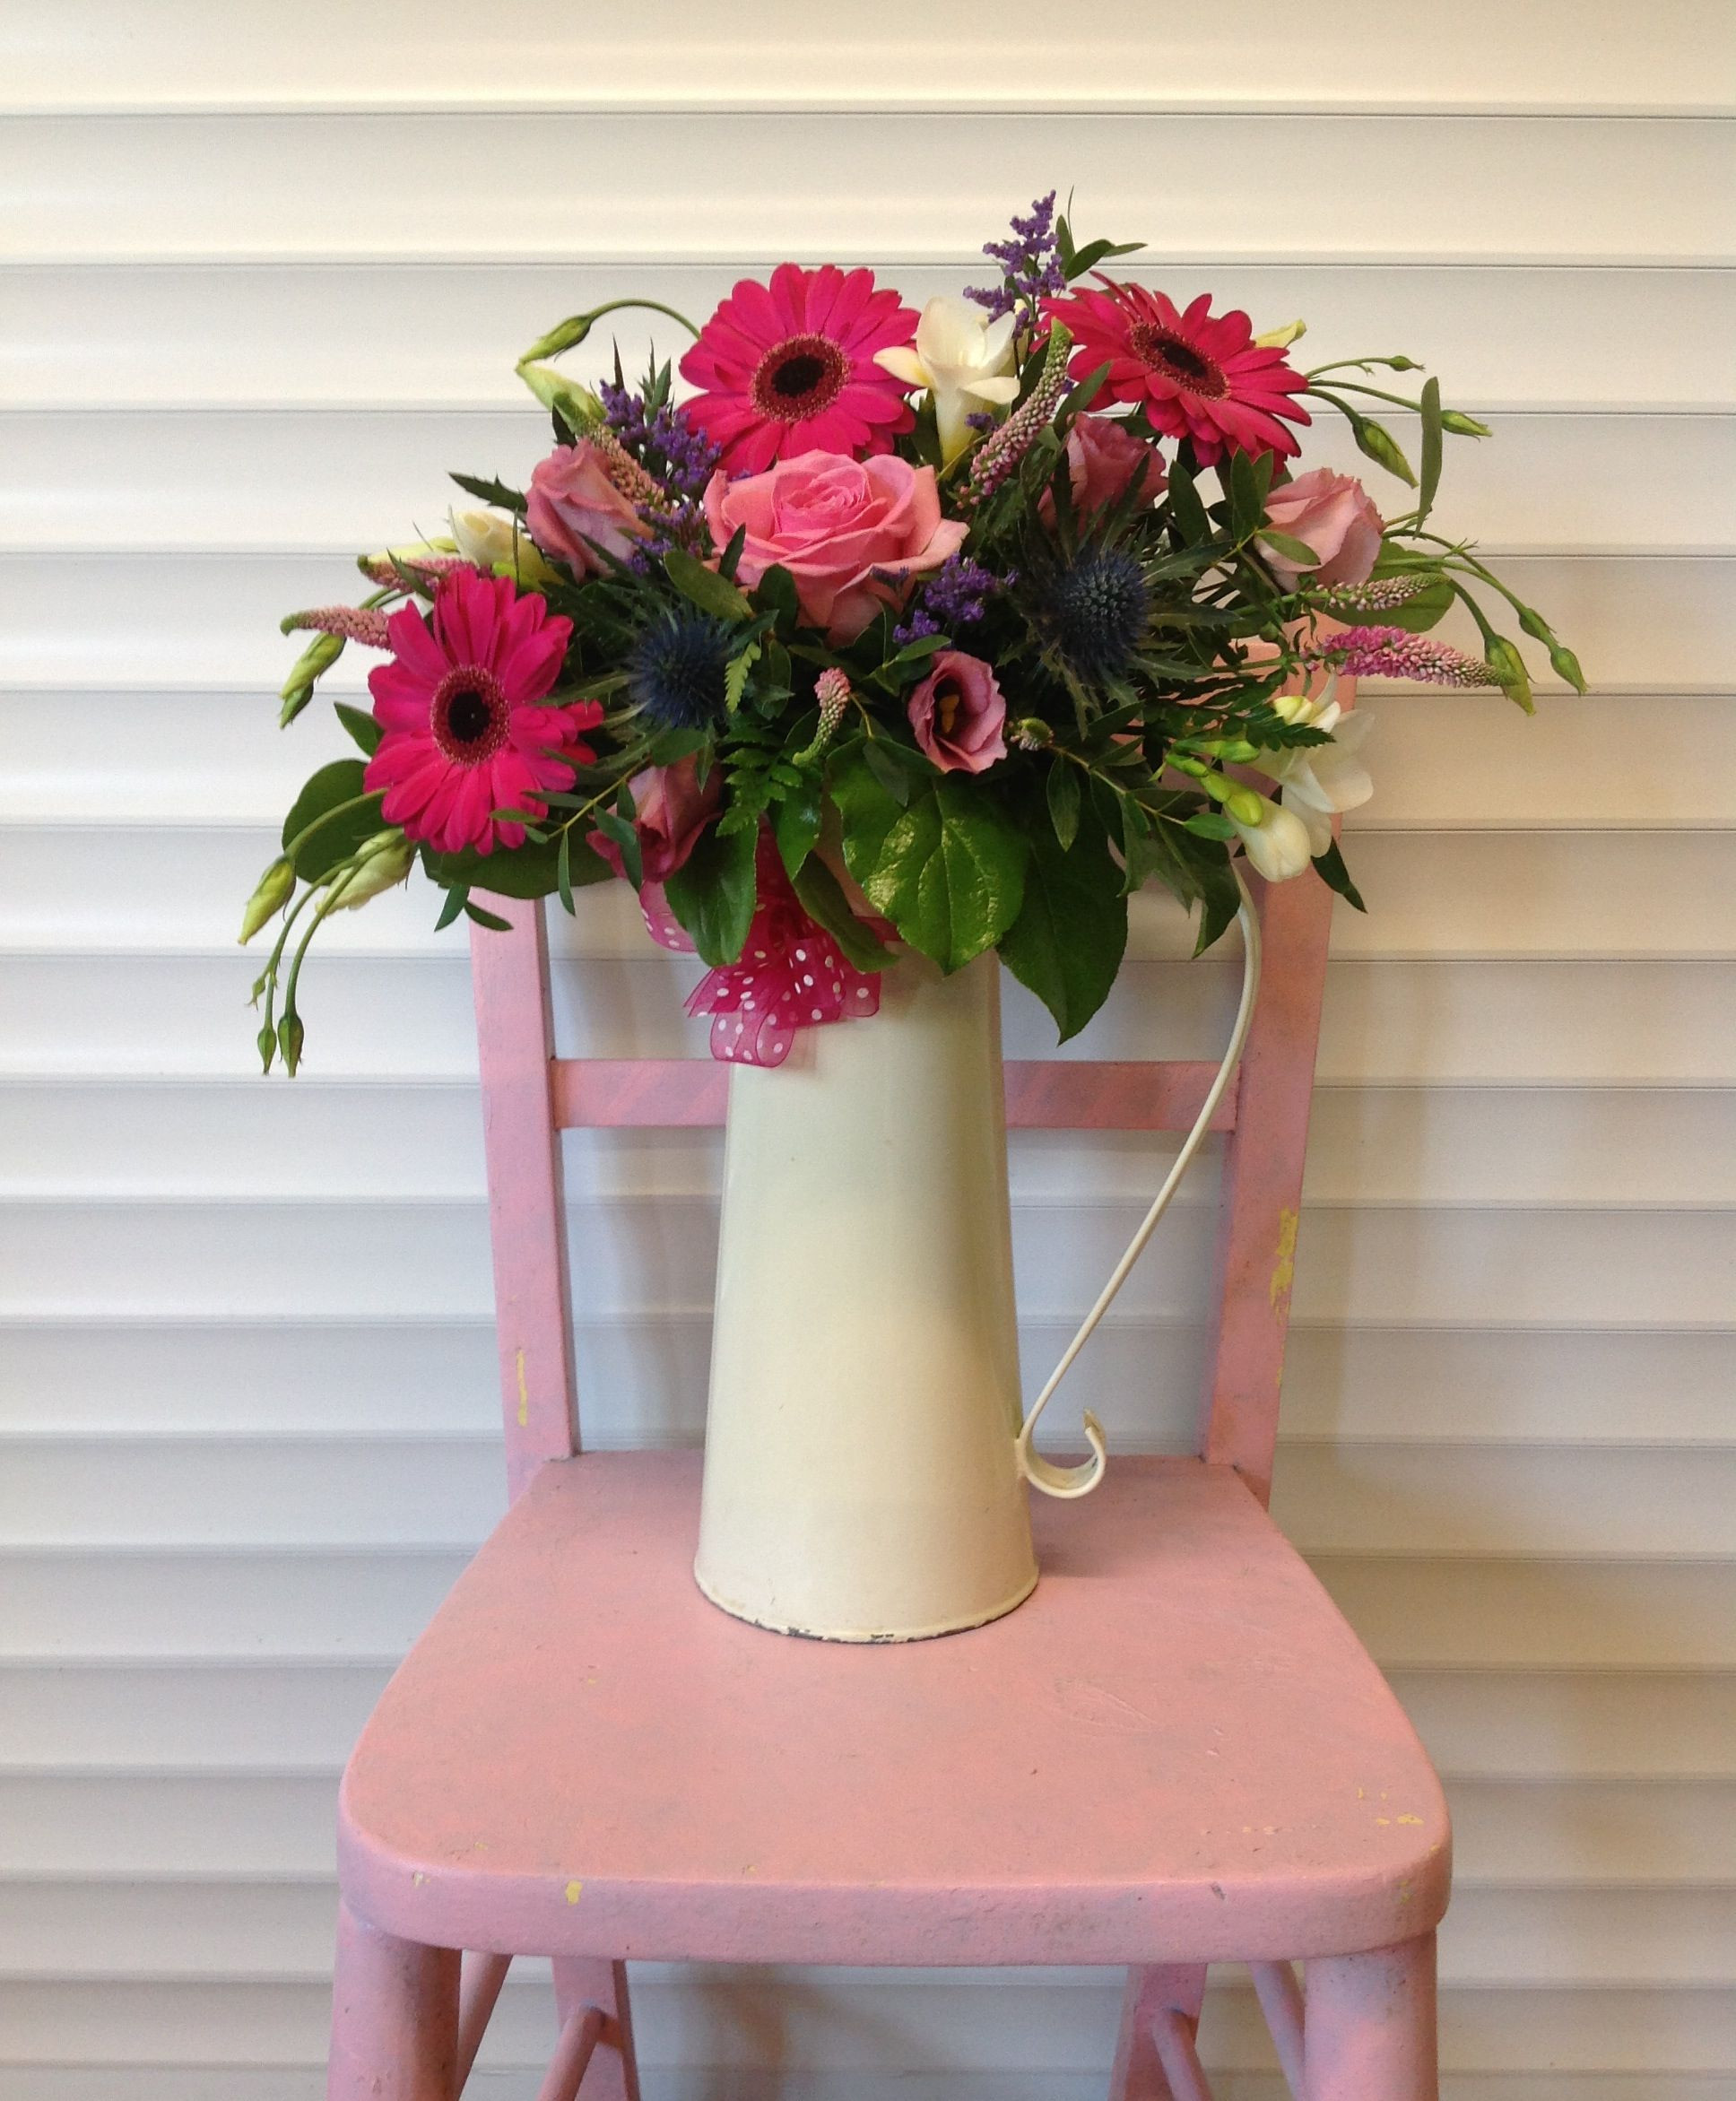 Galvanised Flower Vase Of Vintage Cream Jug Flowers Decoration Ideas Pinterest Wedding In Vintage Cream Jug Flowers